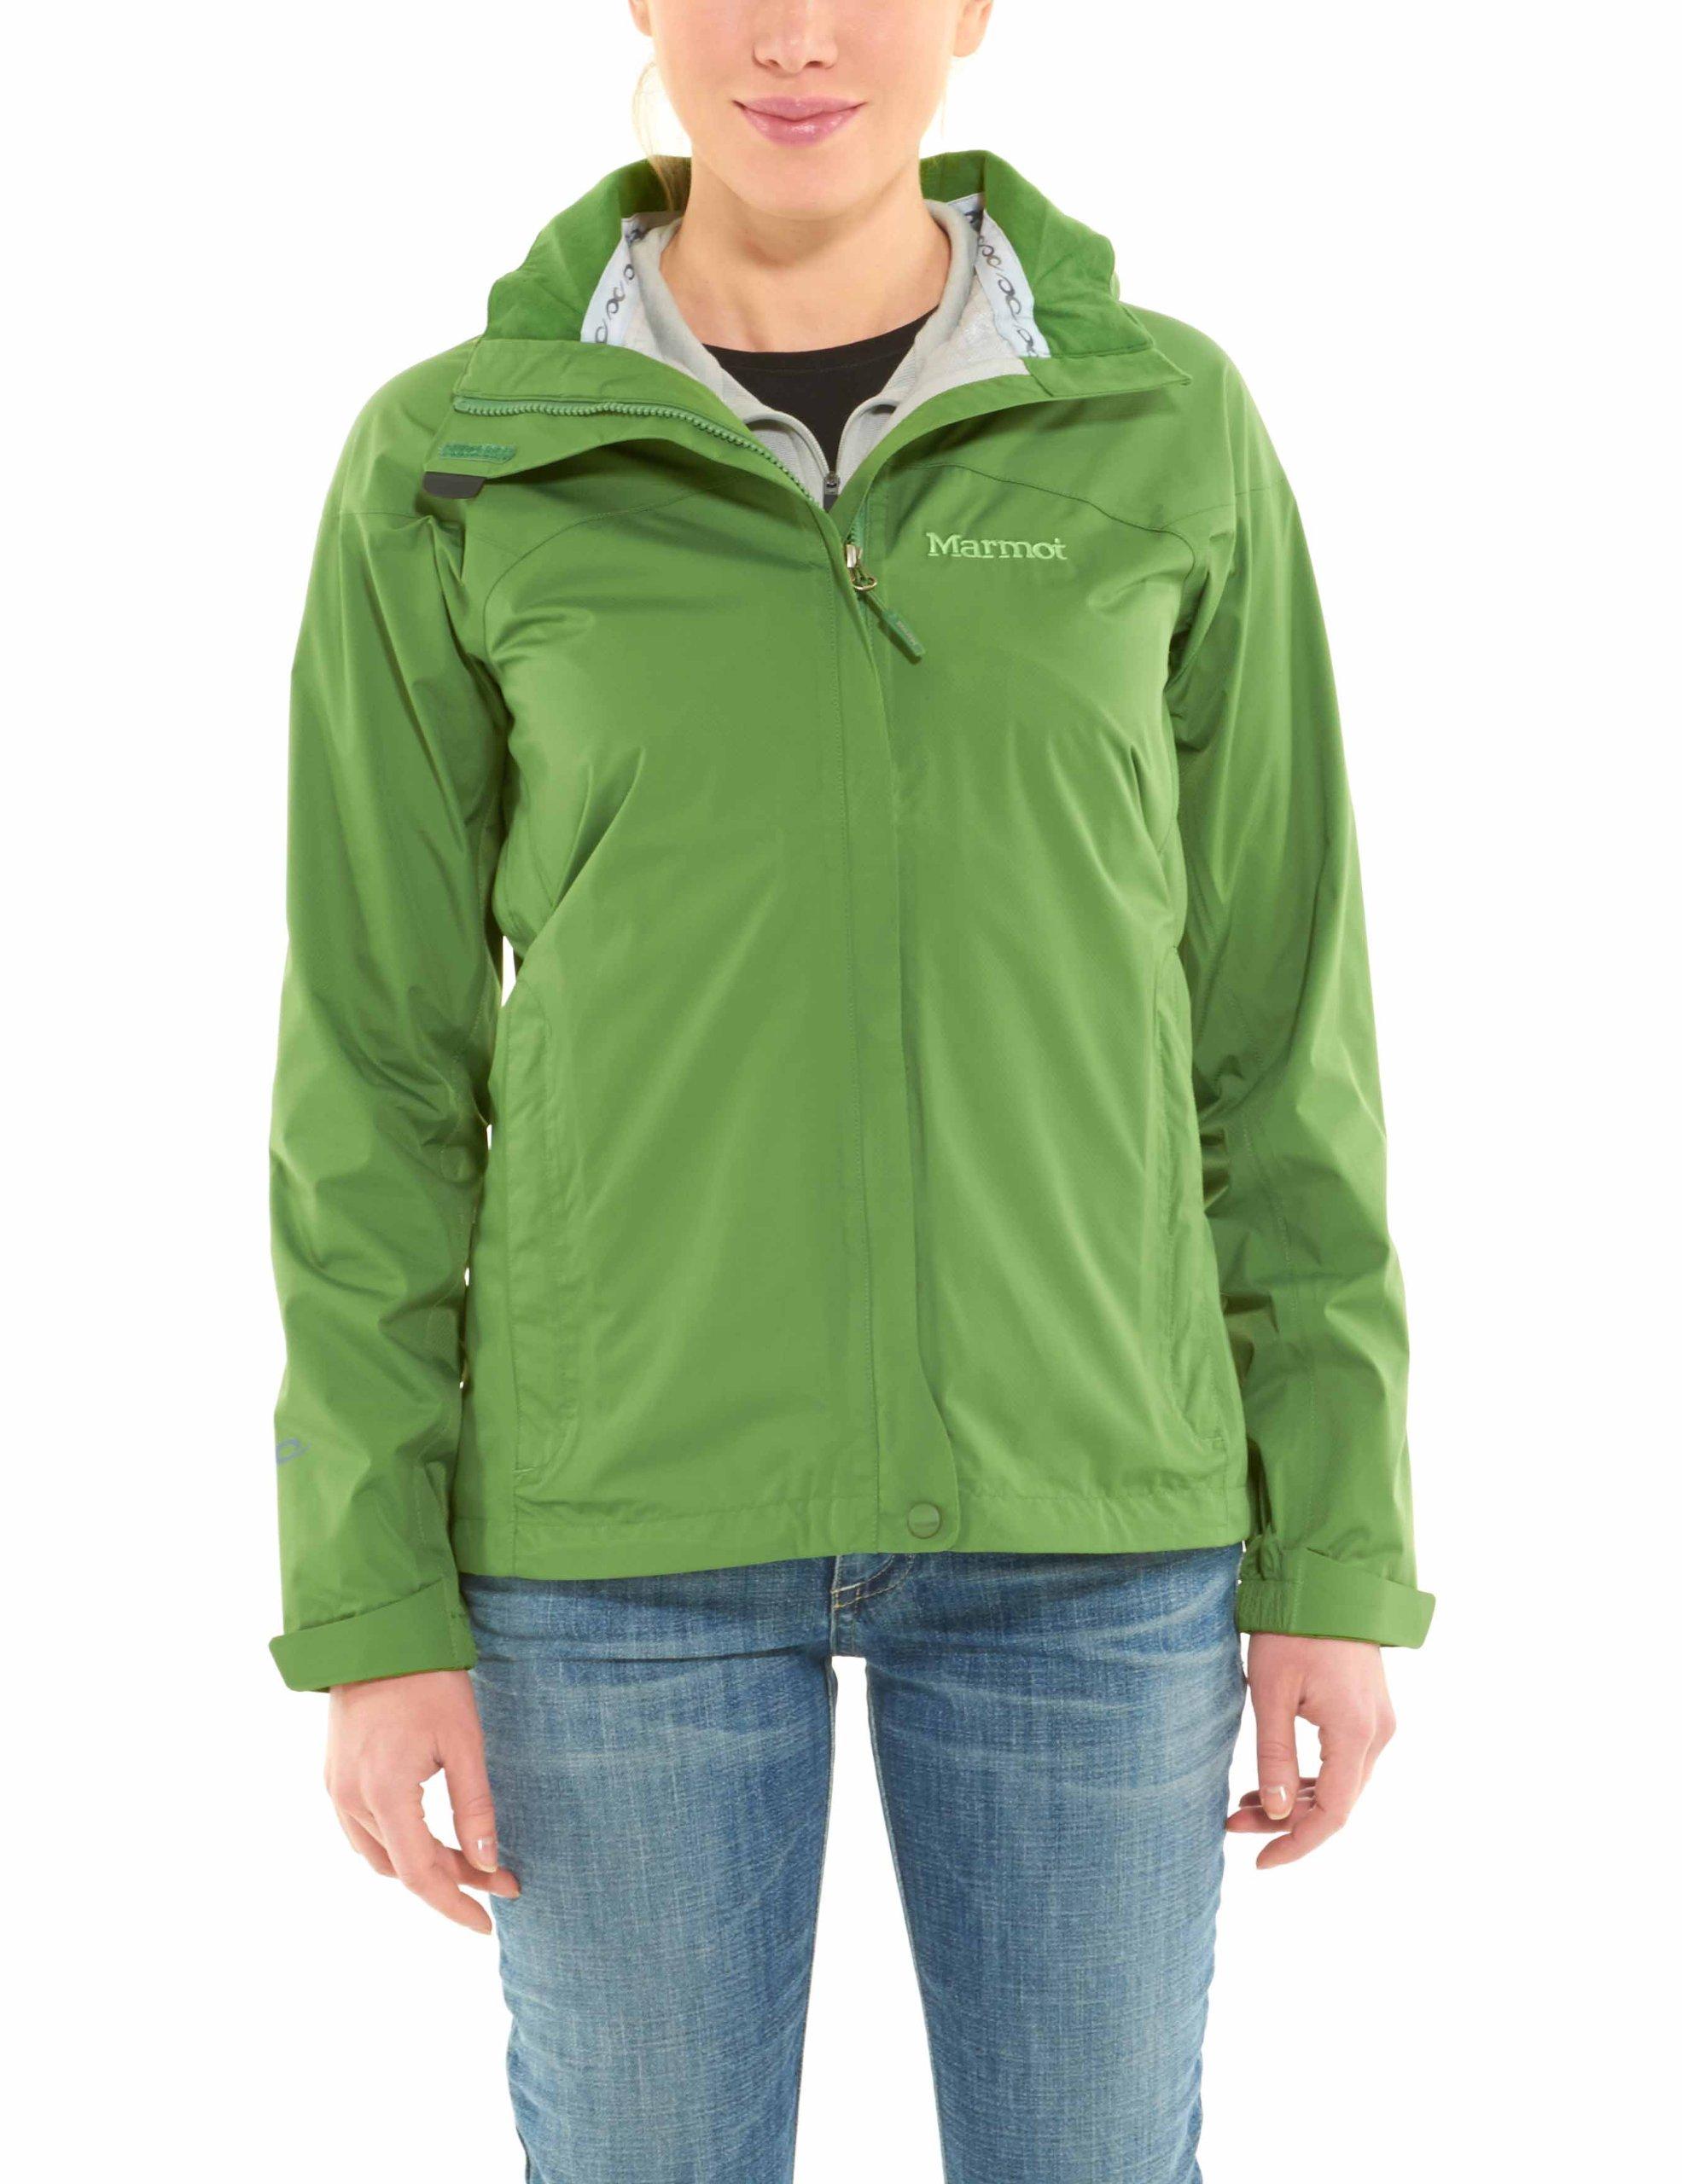 Marmot Phoenix Jacket Womens1261 Style: 1261-4339 Size: M